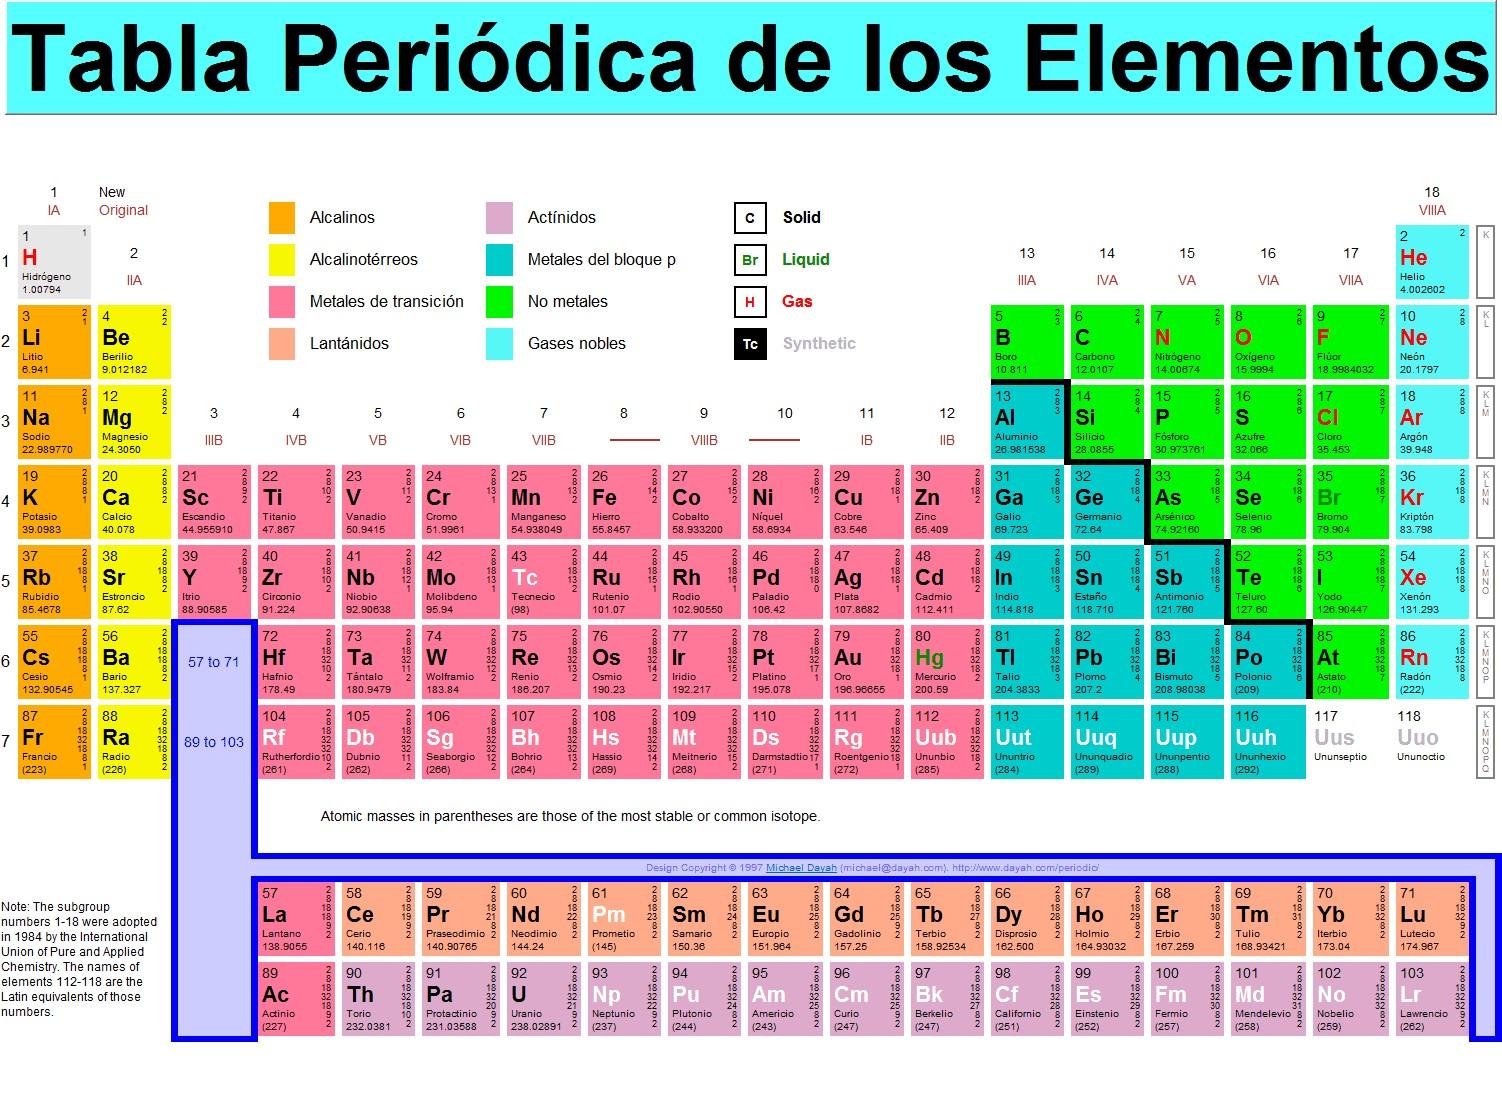 Los elementos de la tabla peridica parte i de norte a sur los elementos de la tabla peridica parte i urtaz Images